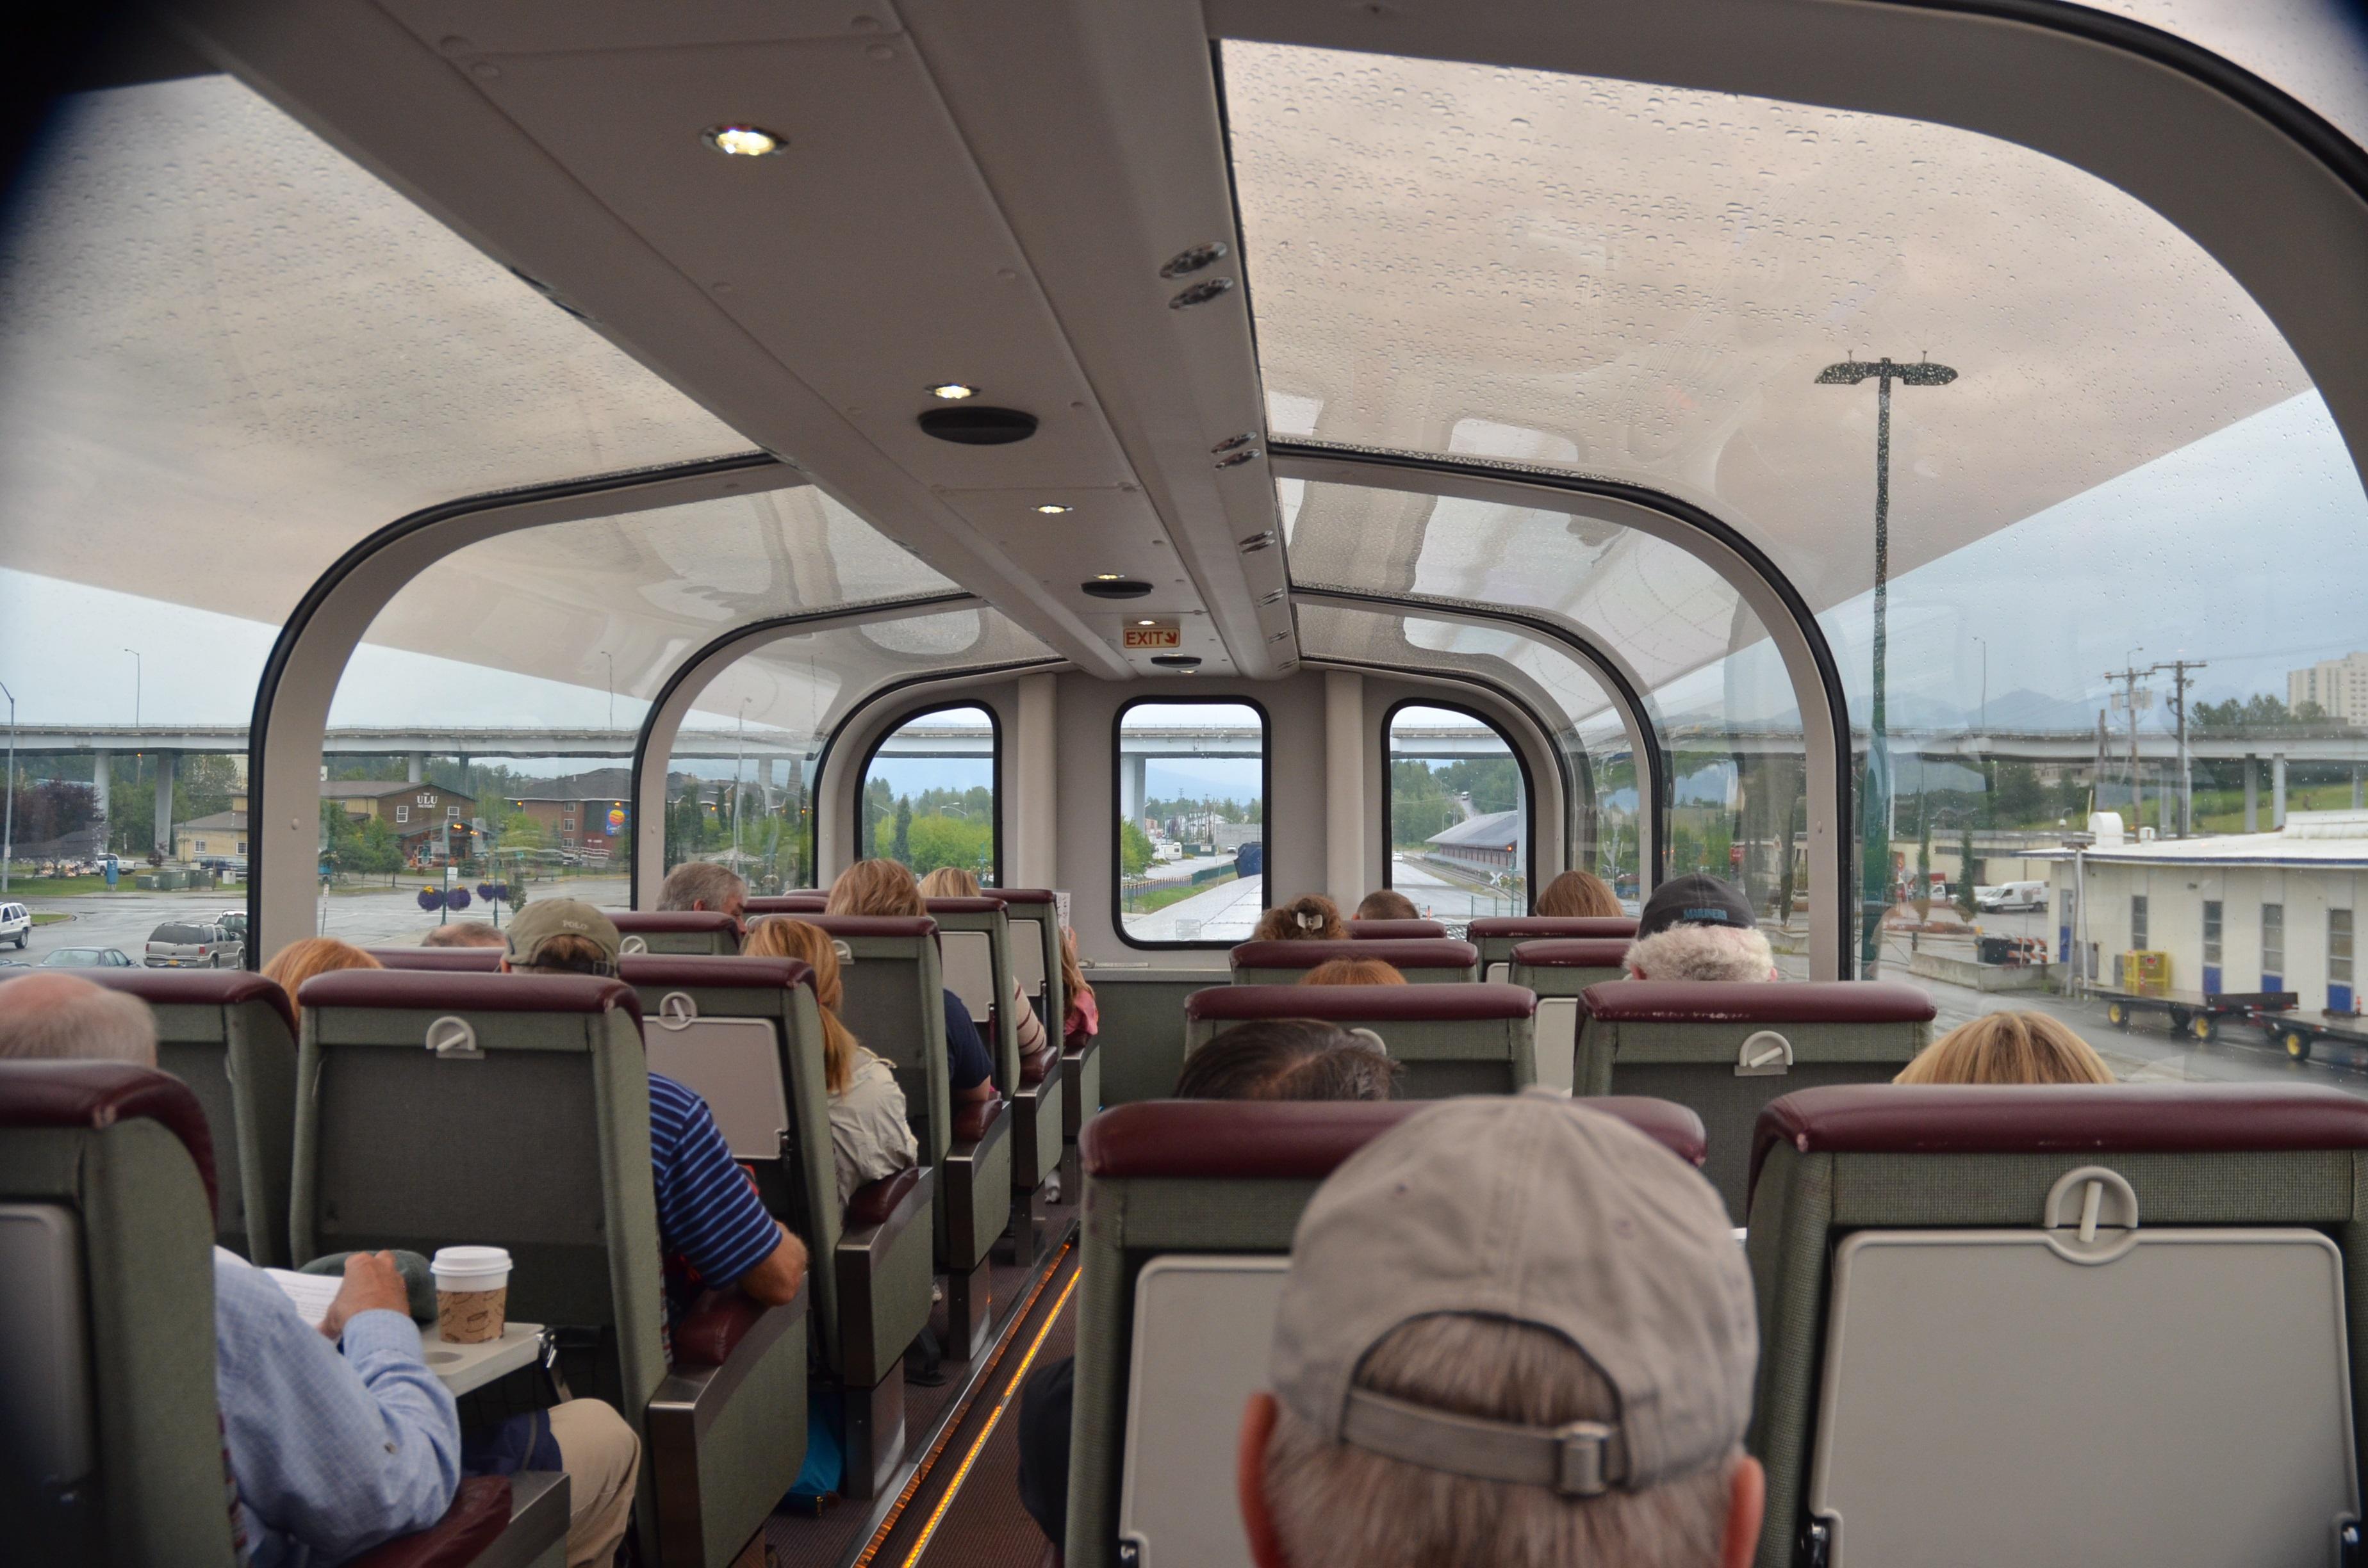 Railroad train - inside observation car